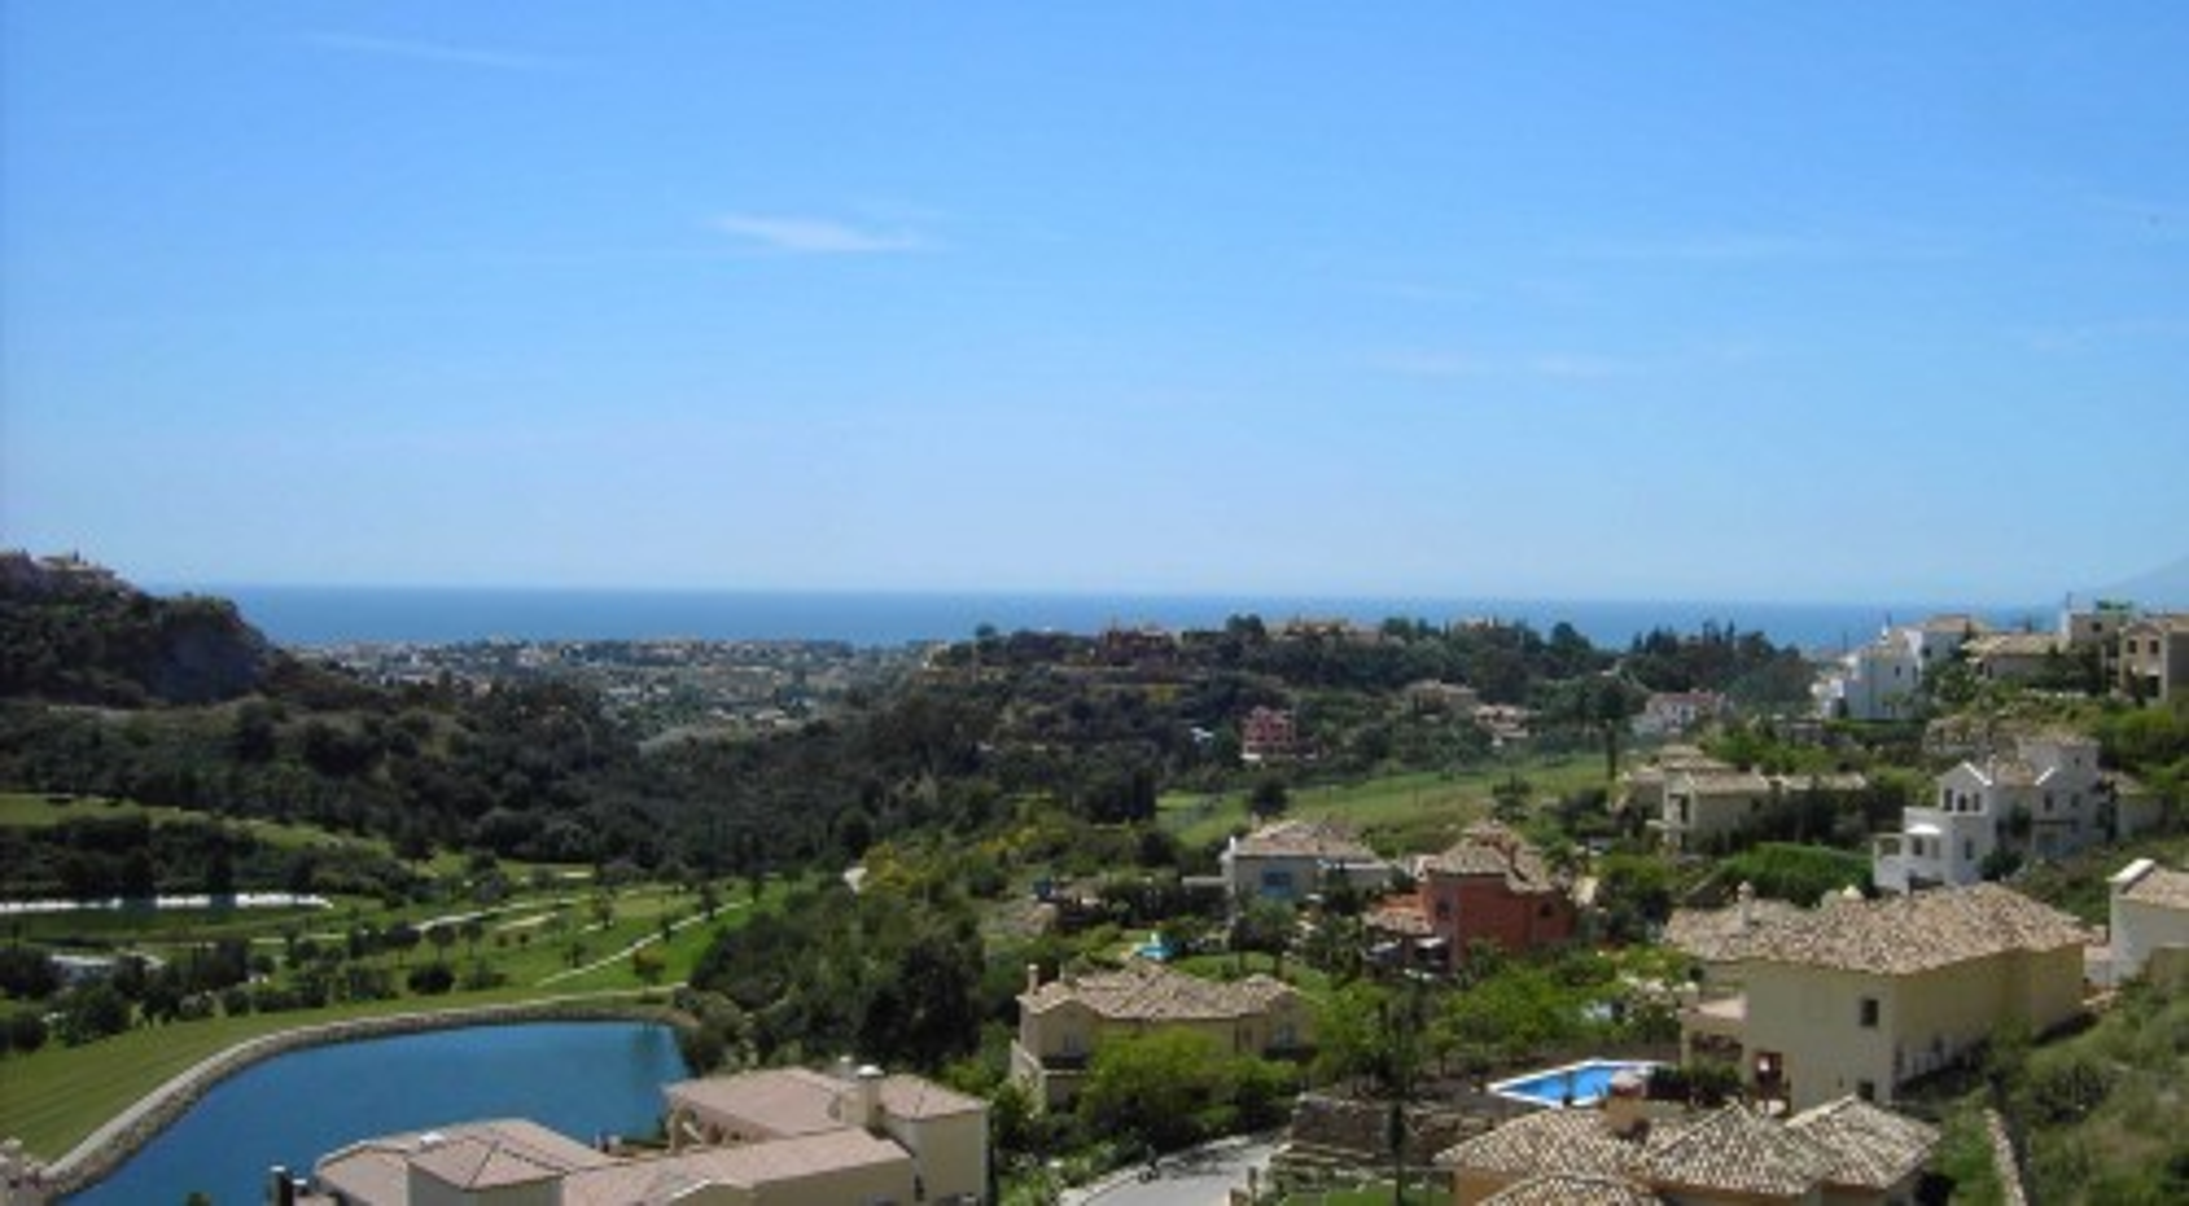 Los Arqueros, a private community in Marbella